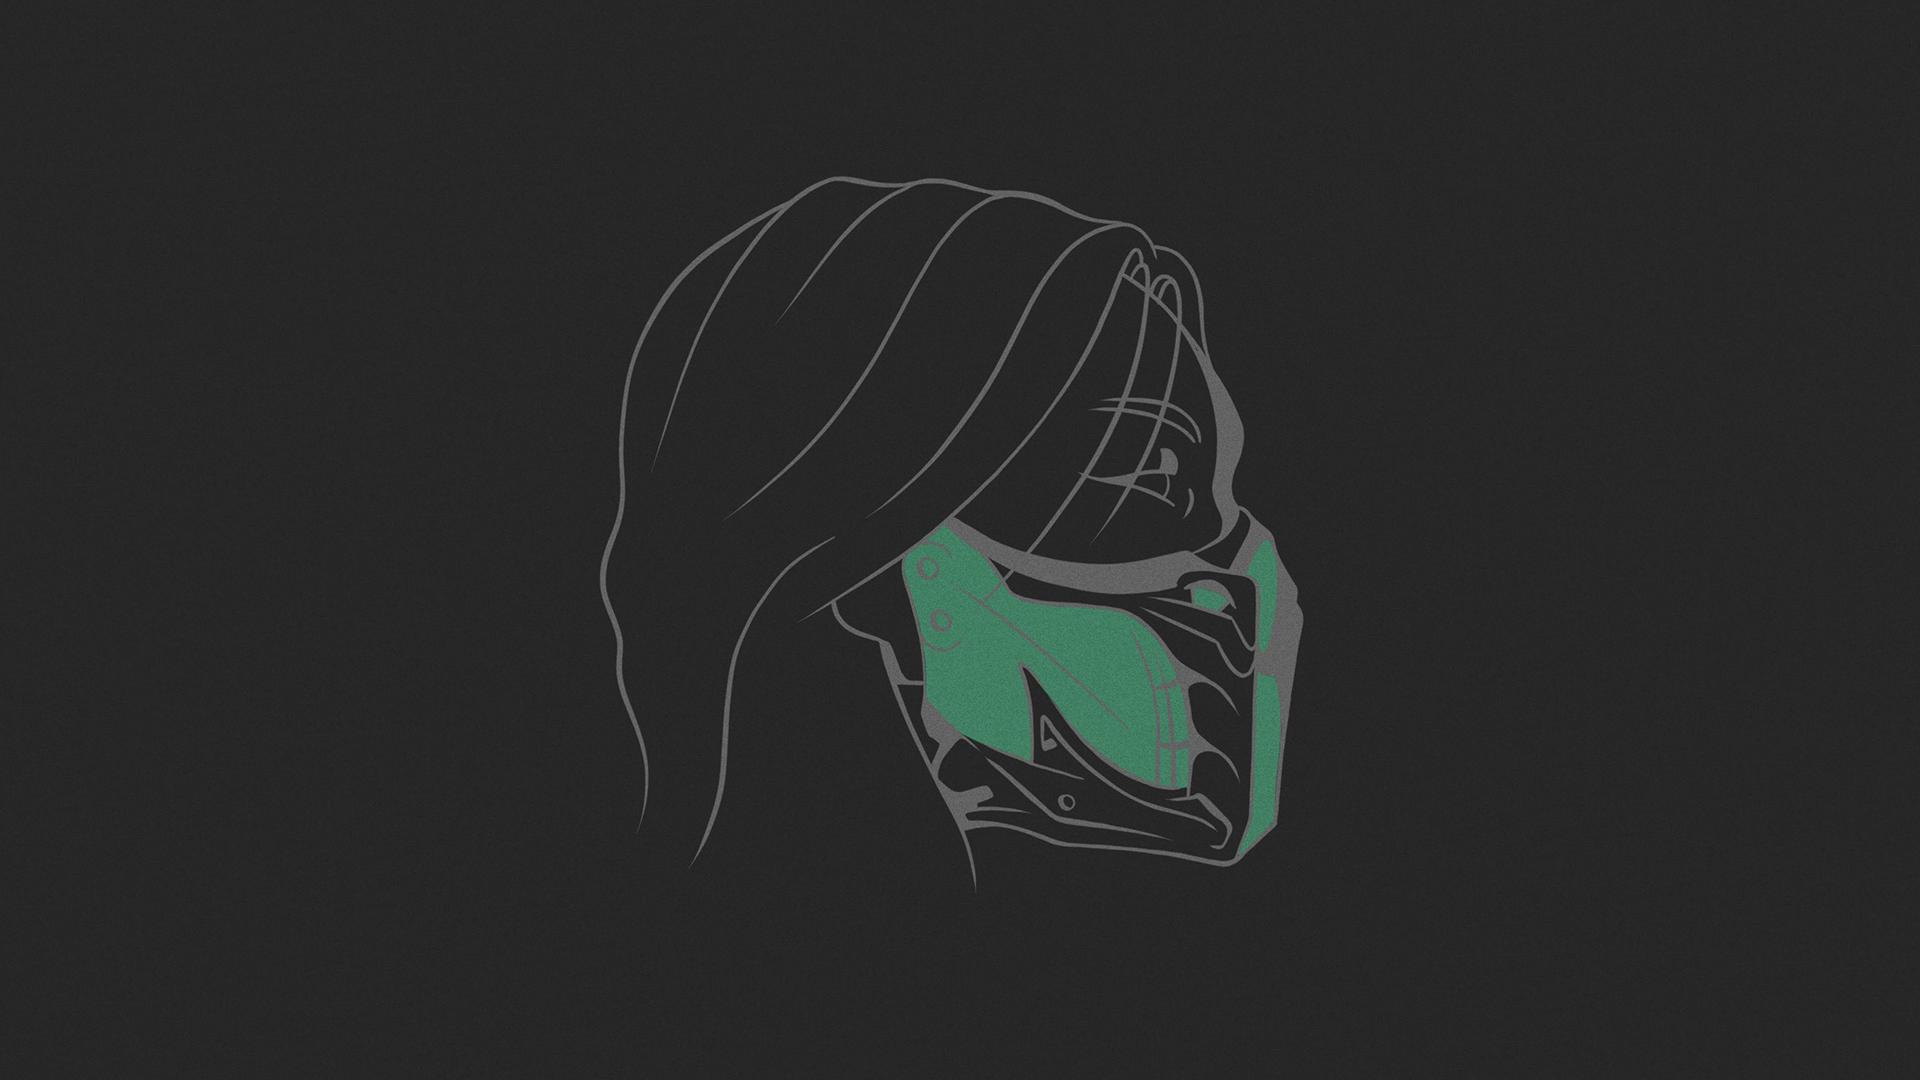 General 1920x1080 Mortal Kombat Mortal Kombat 11 simple simple background